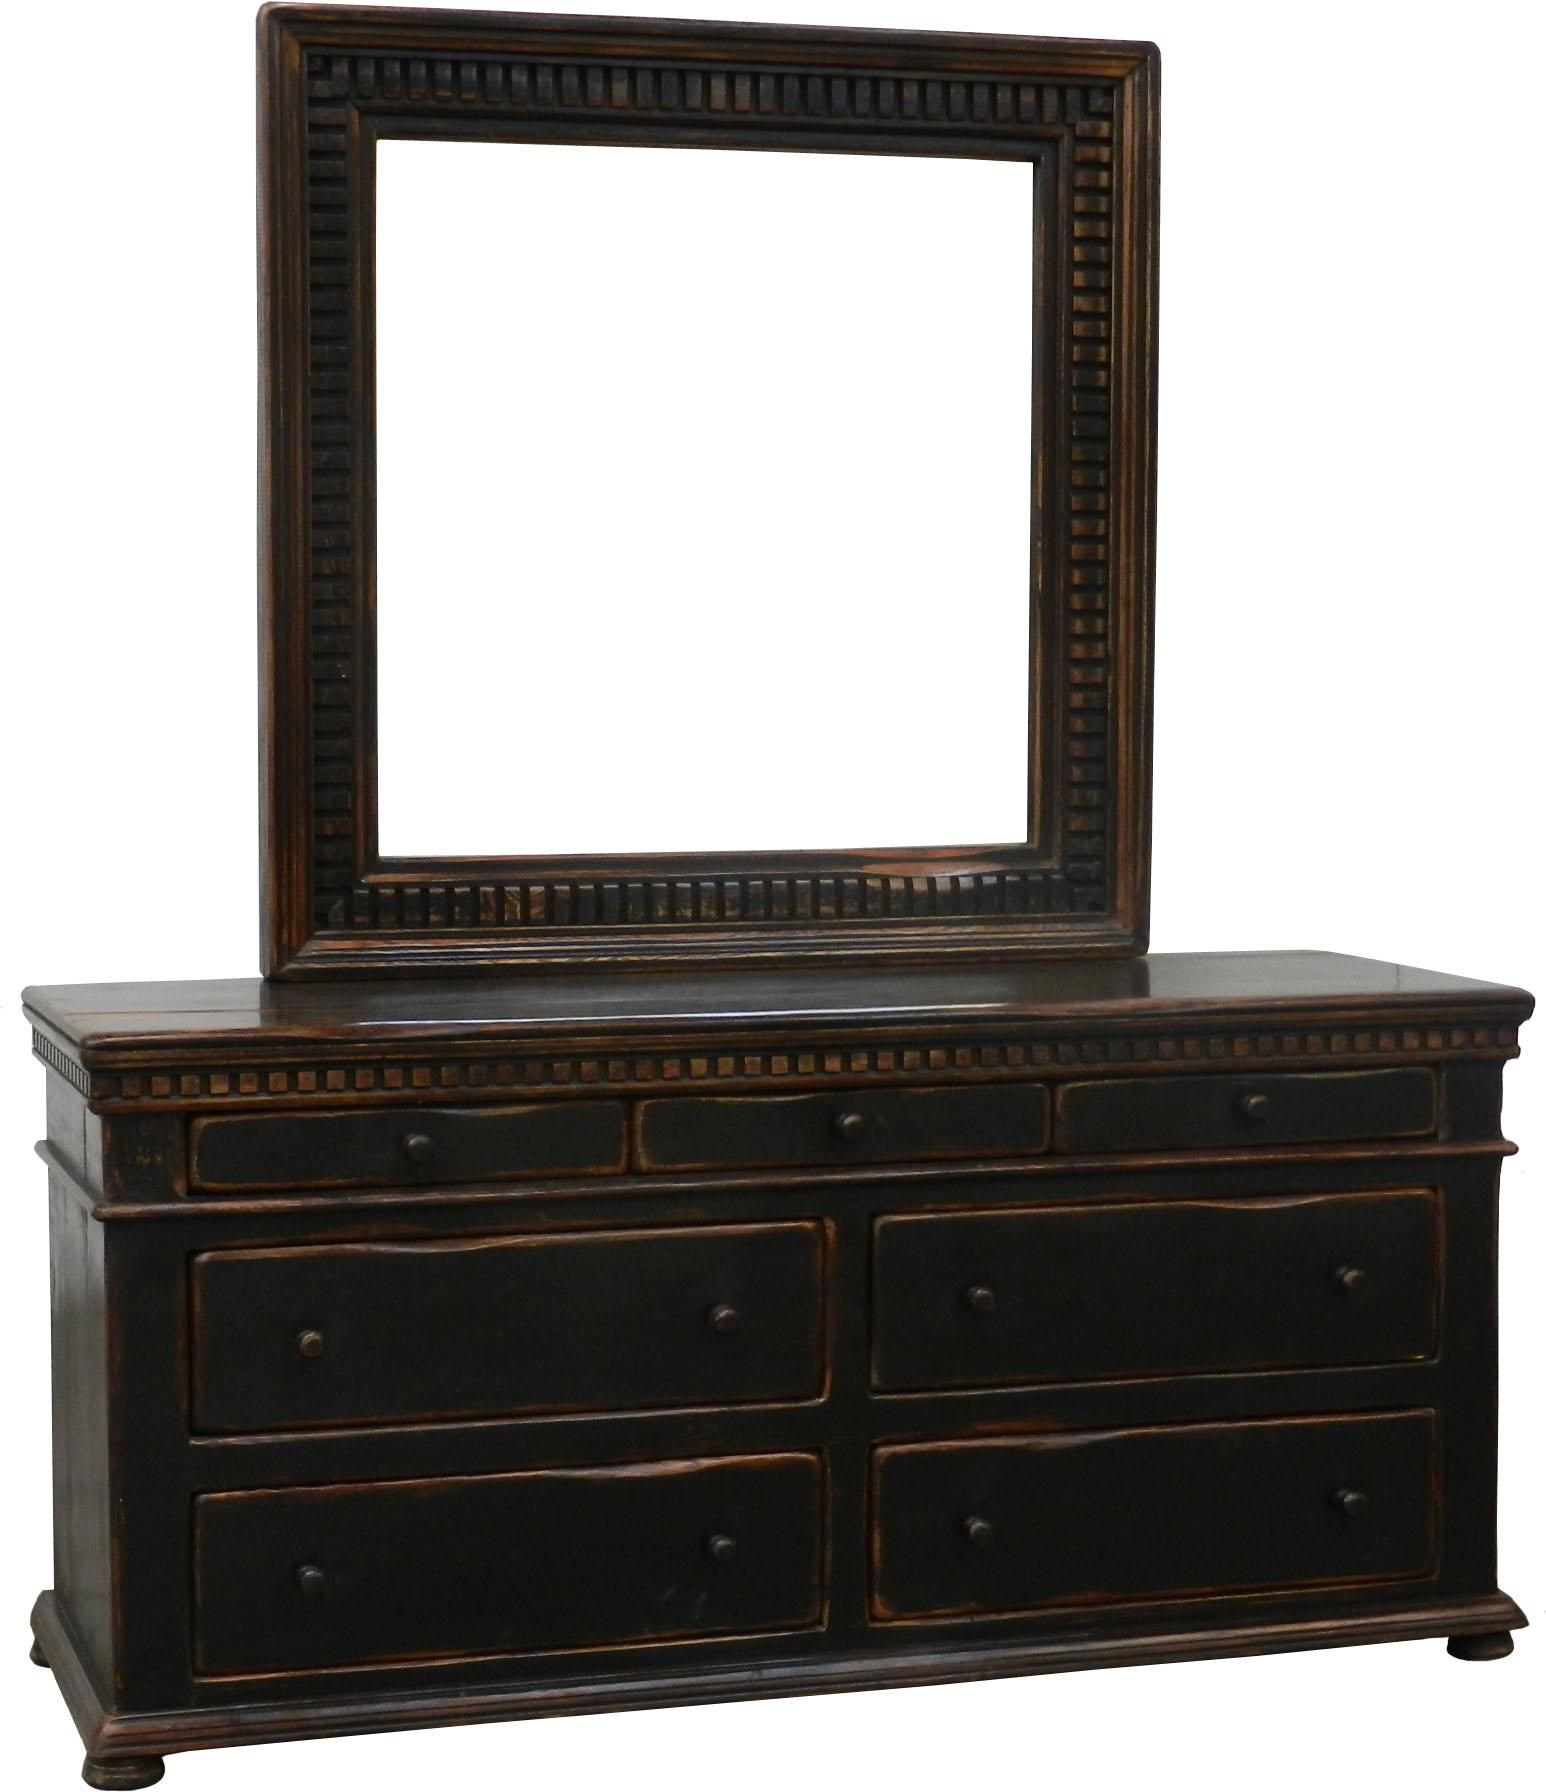 Beau Furniture Source International Easton 7 Drawer Dresser U0026 Mirror Set